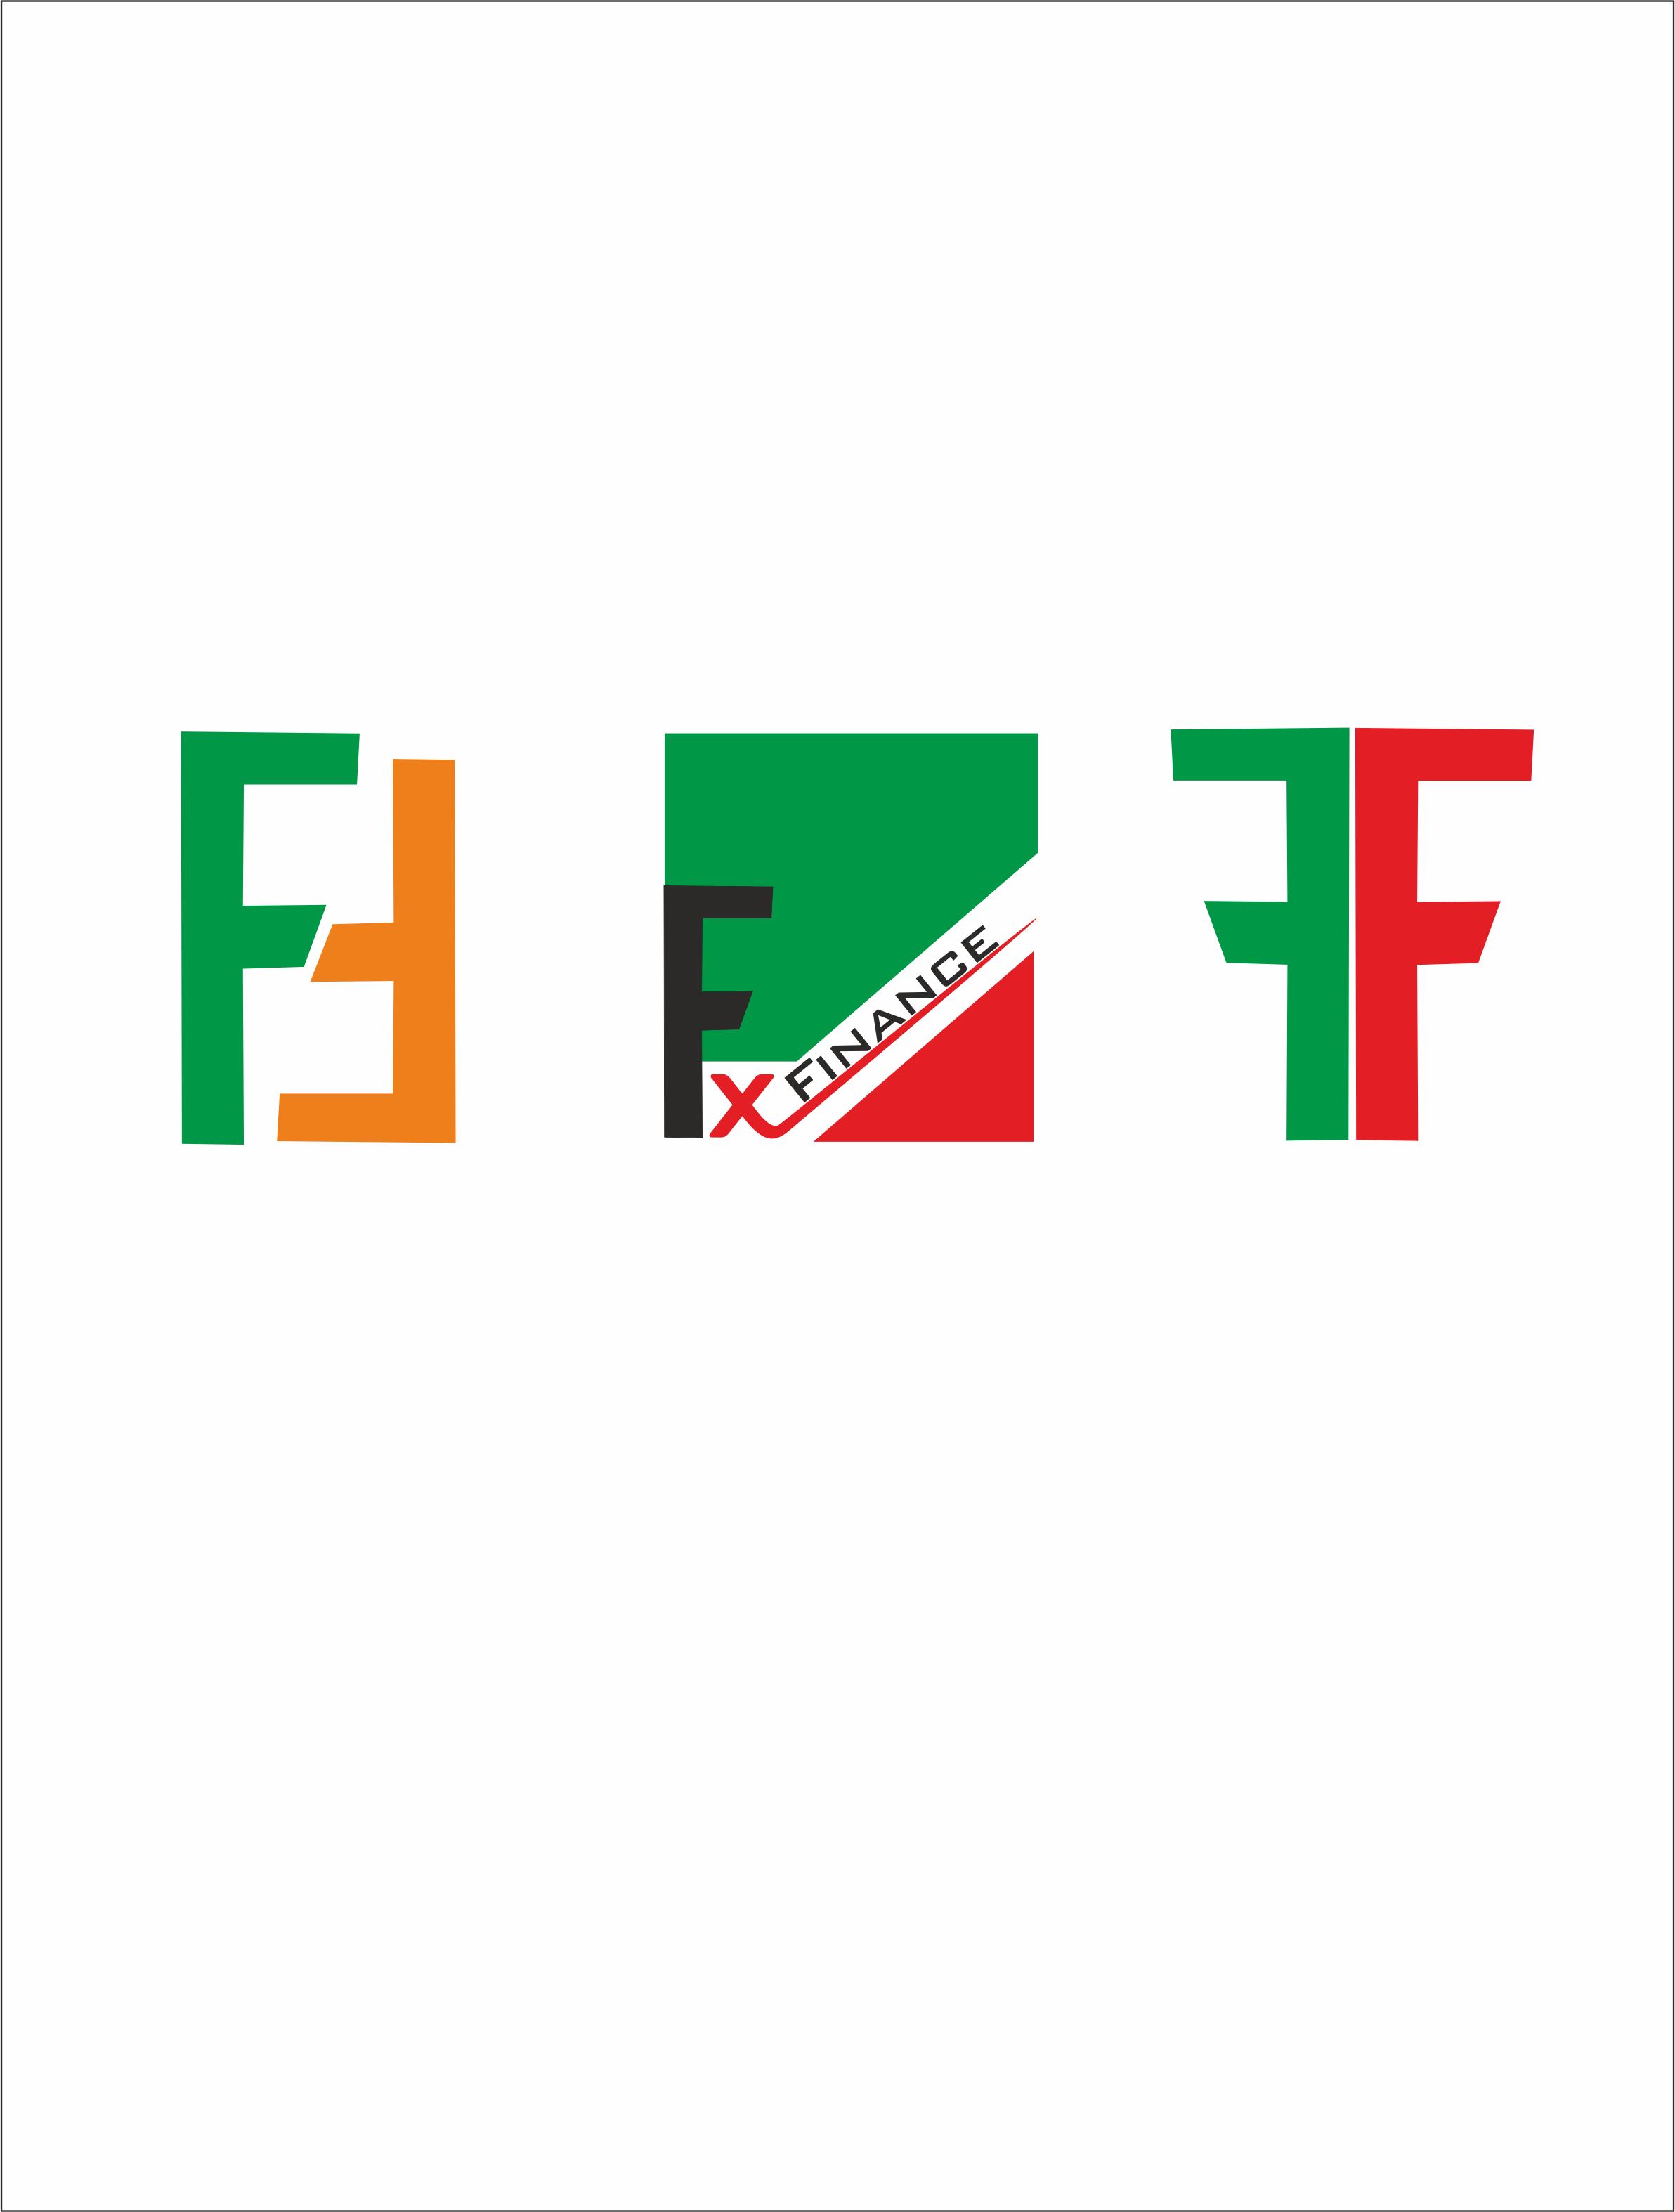 Разработка логотипа для компании FxFinance фото f_32951121abdc1598.jpg